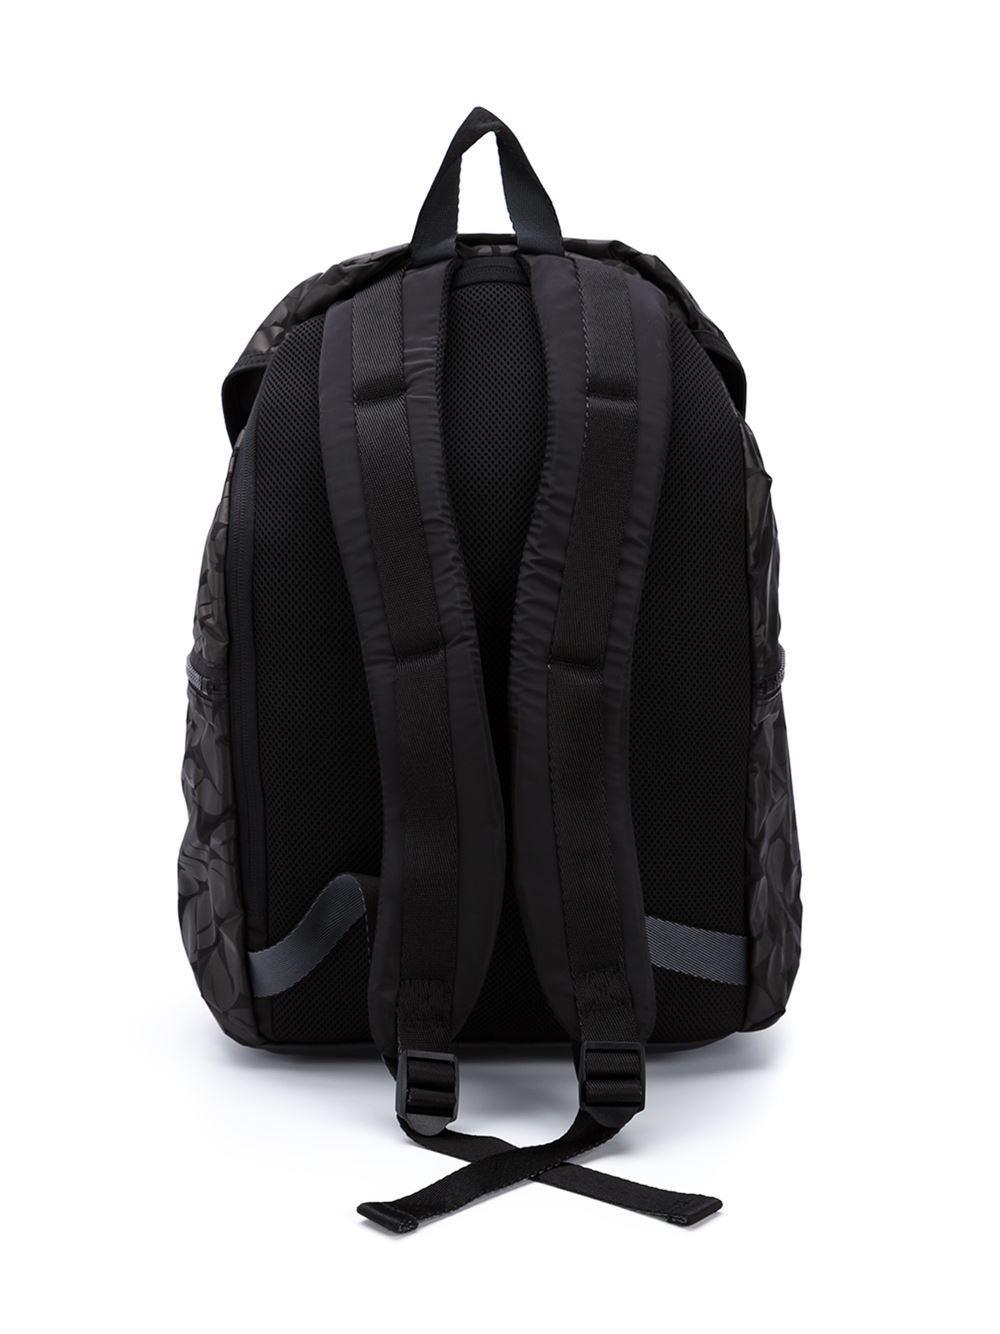 adidas by stella mccartney 39 weekender 39 backpack in gray black lyst. Black Bedroom Furniture Sets. Home Design Ideas